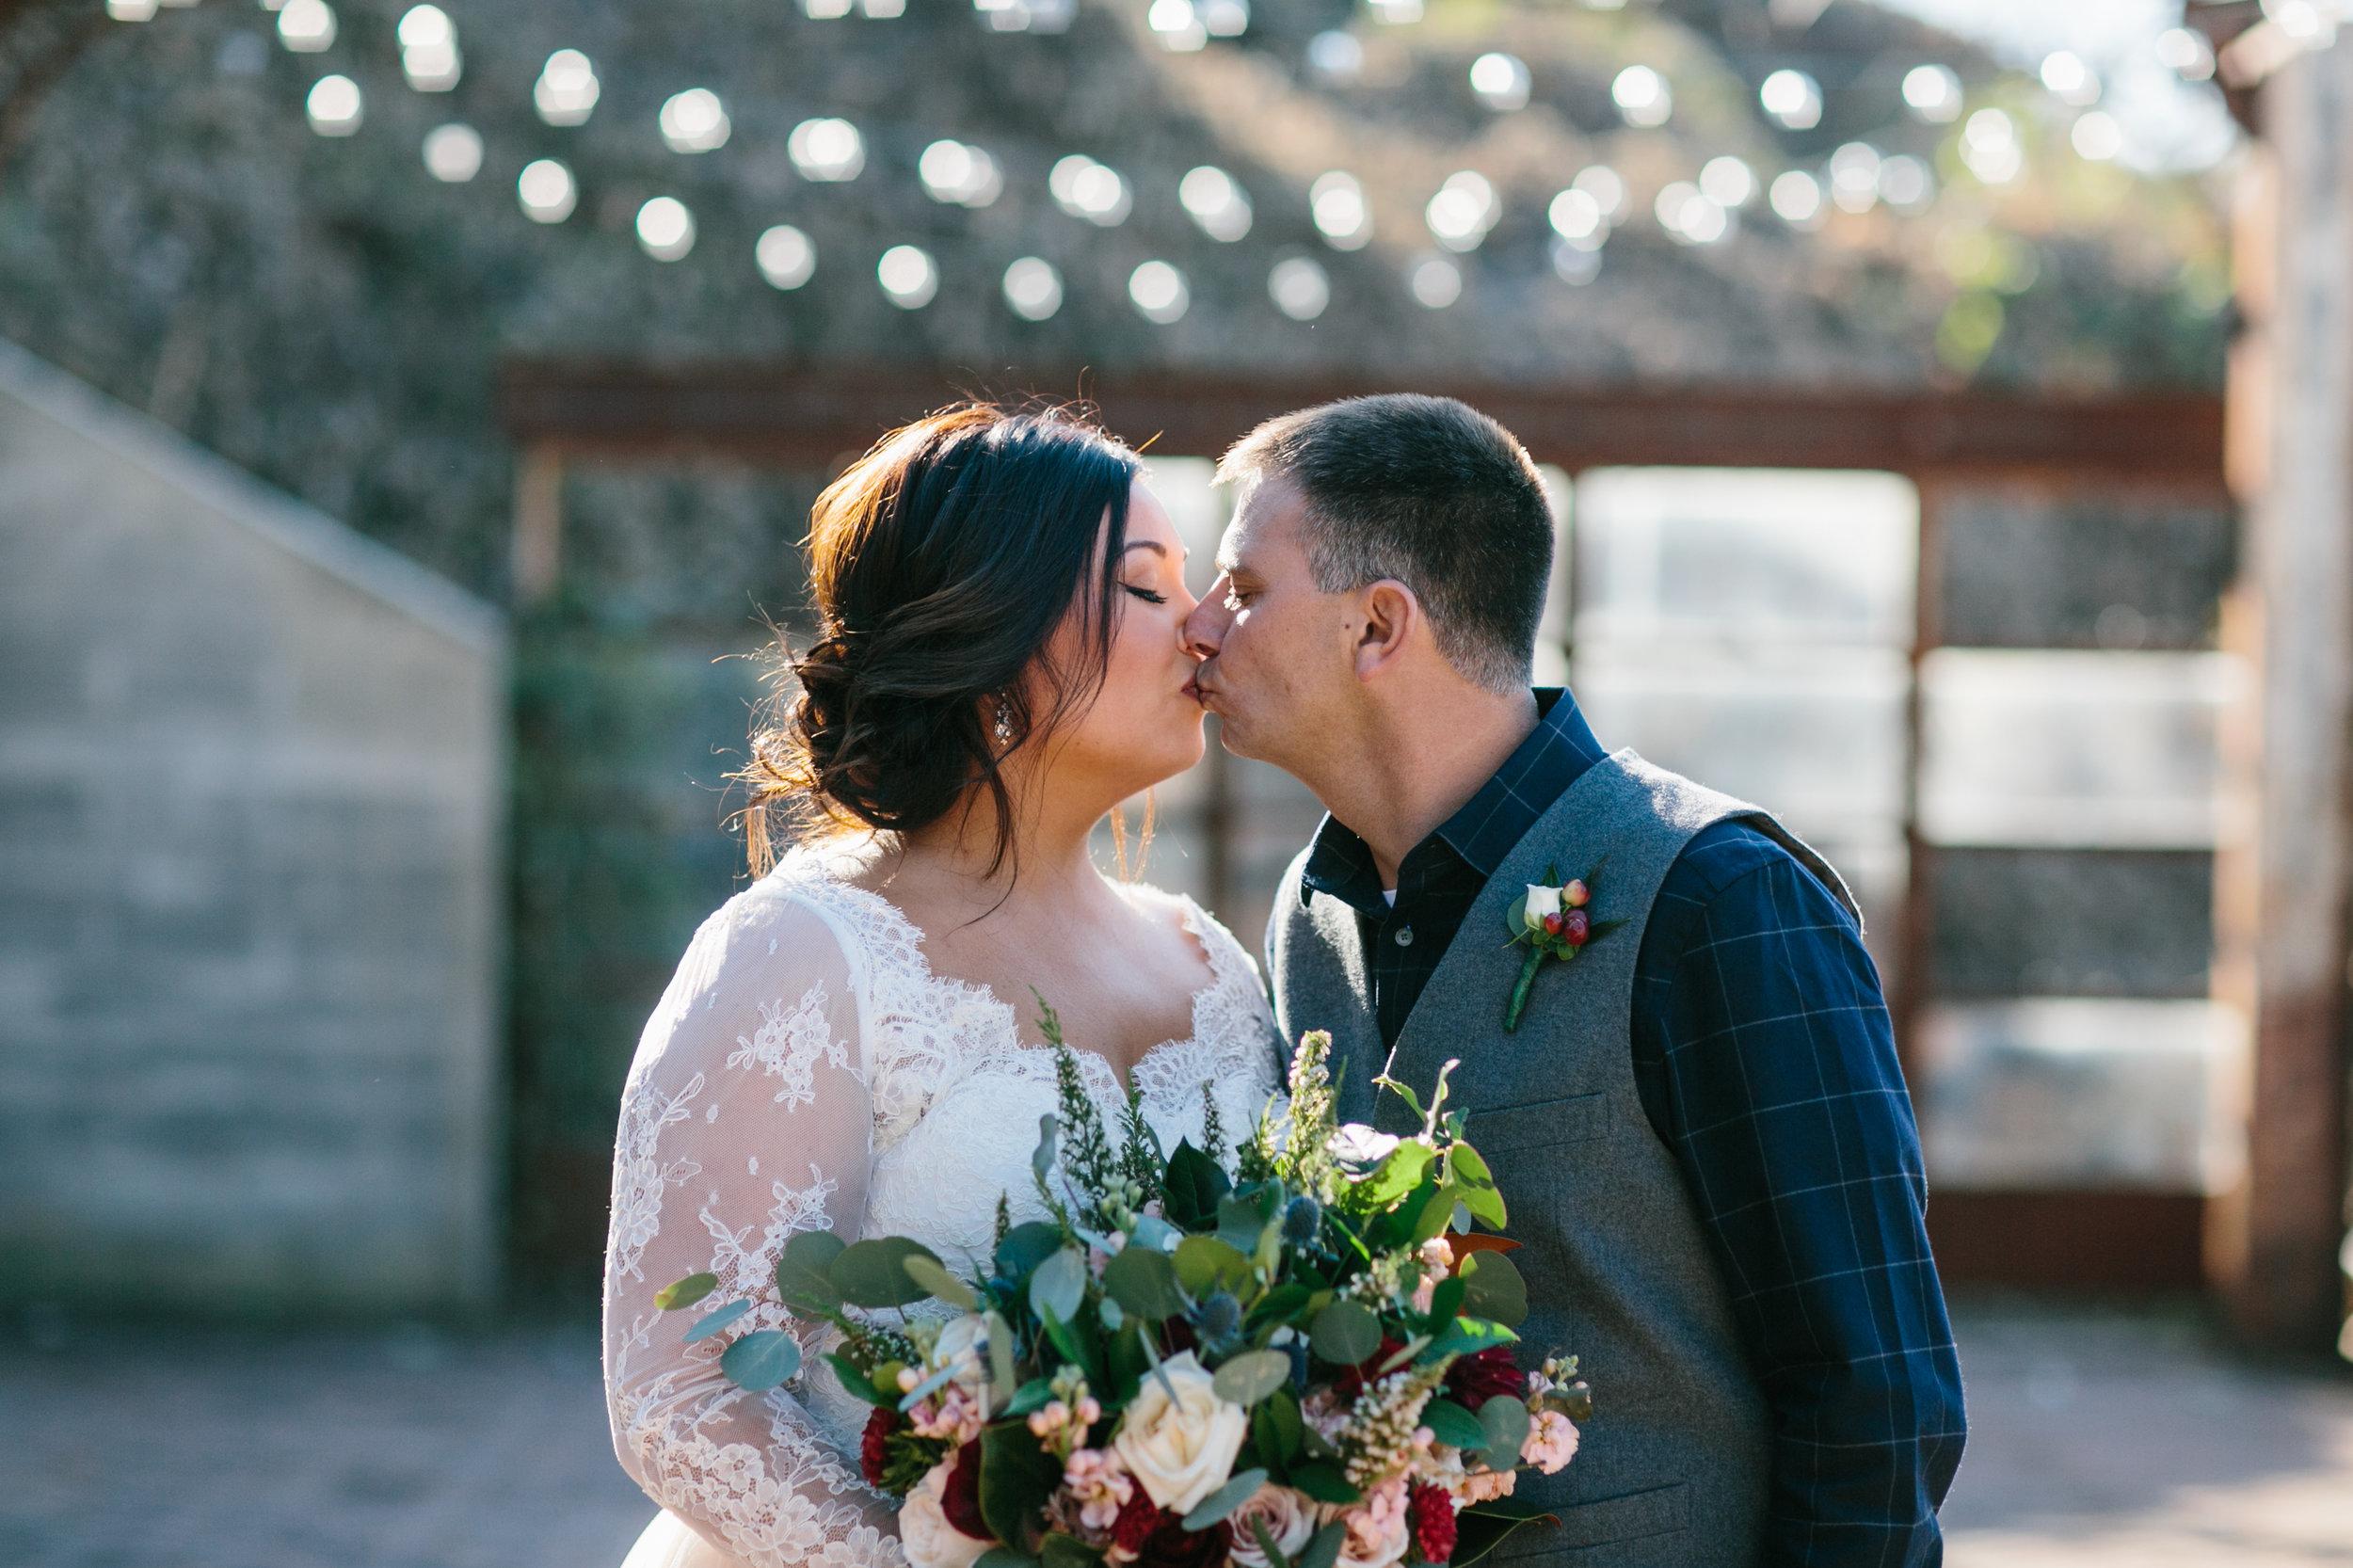 Lauren_Jeremy_Standard_Wedding_Knoxville_Abigail_Malone_Photography_FIlm-191.jpg